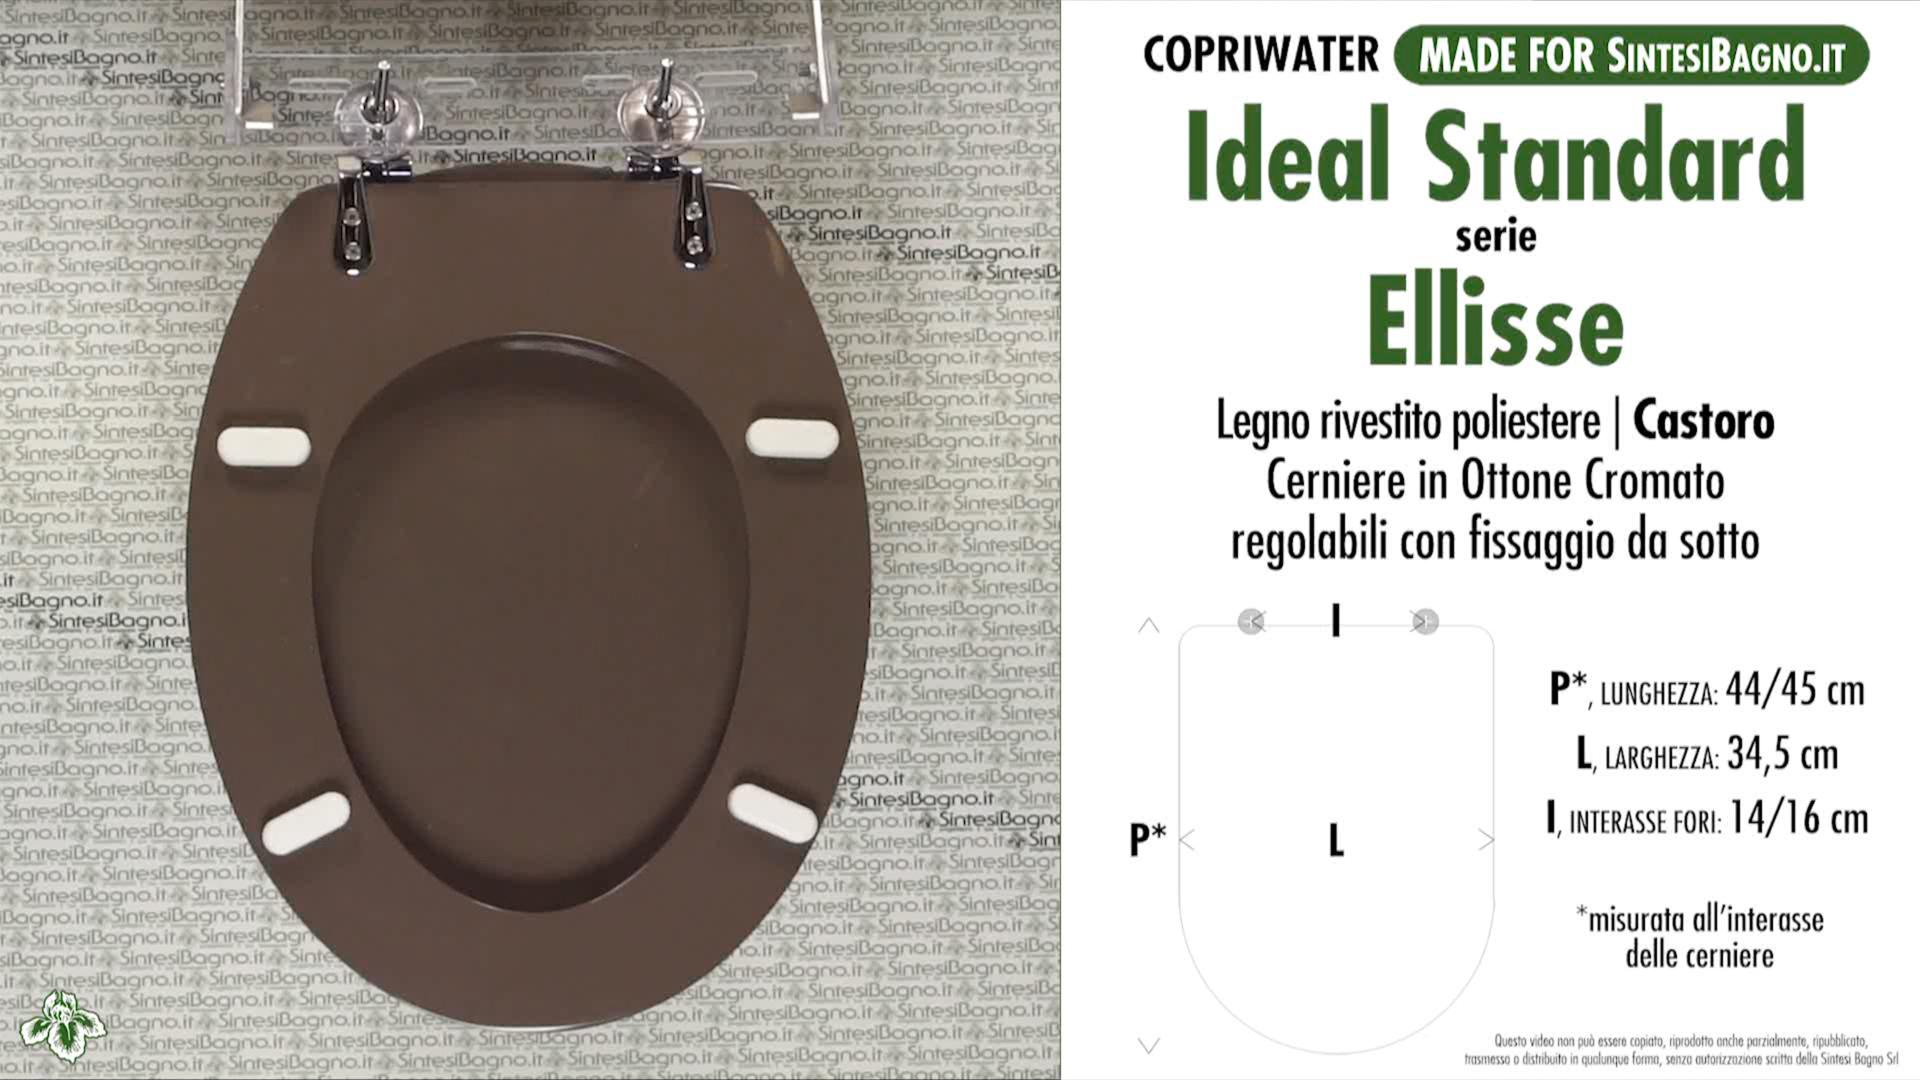 Copriwater Per Vaso Ellisse Ideal Standard Castoro